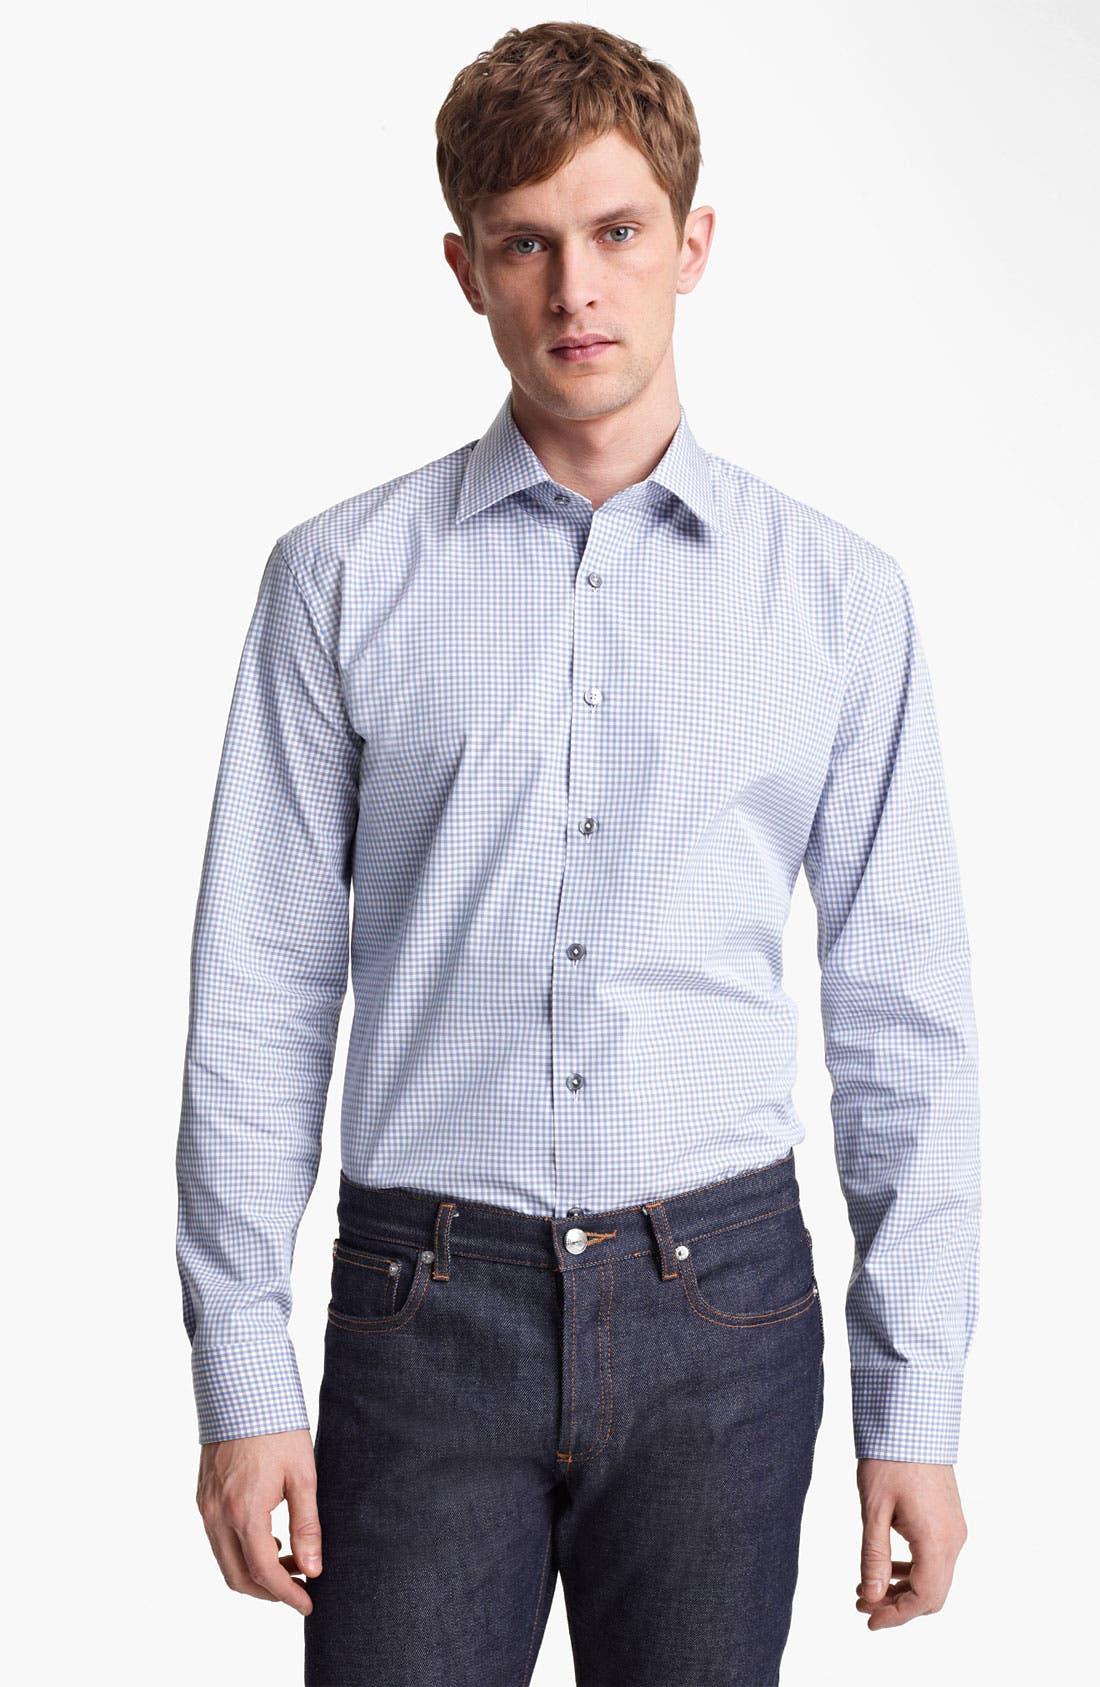 Alternate Image 1 Selected - Paul Smith London Micro Gingham Dress Shirt